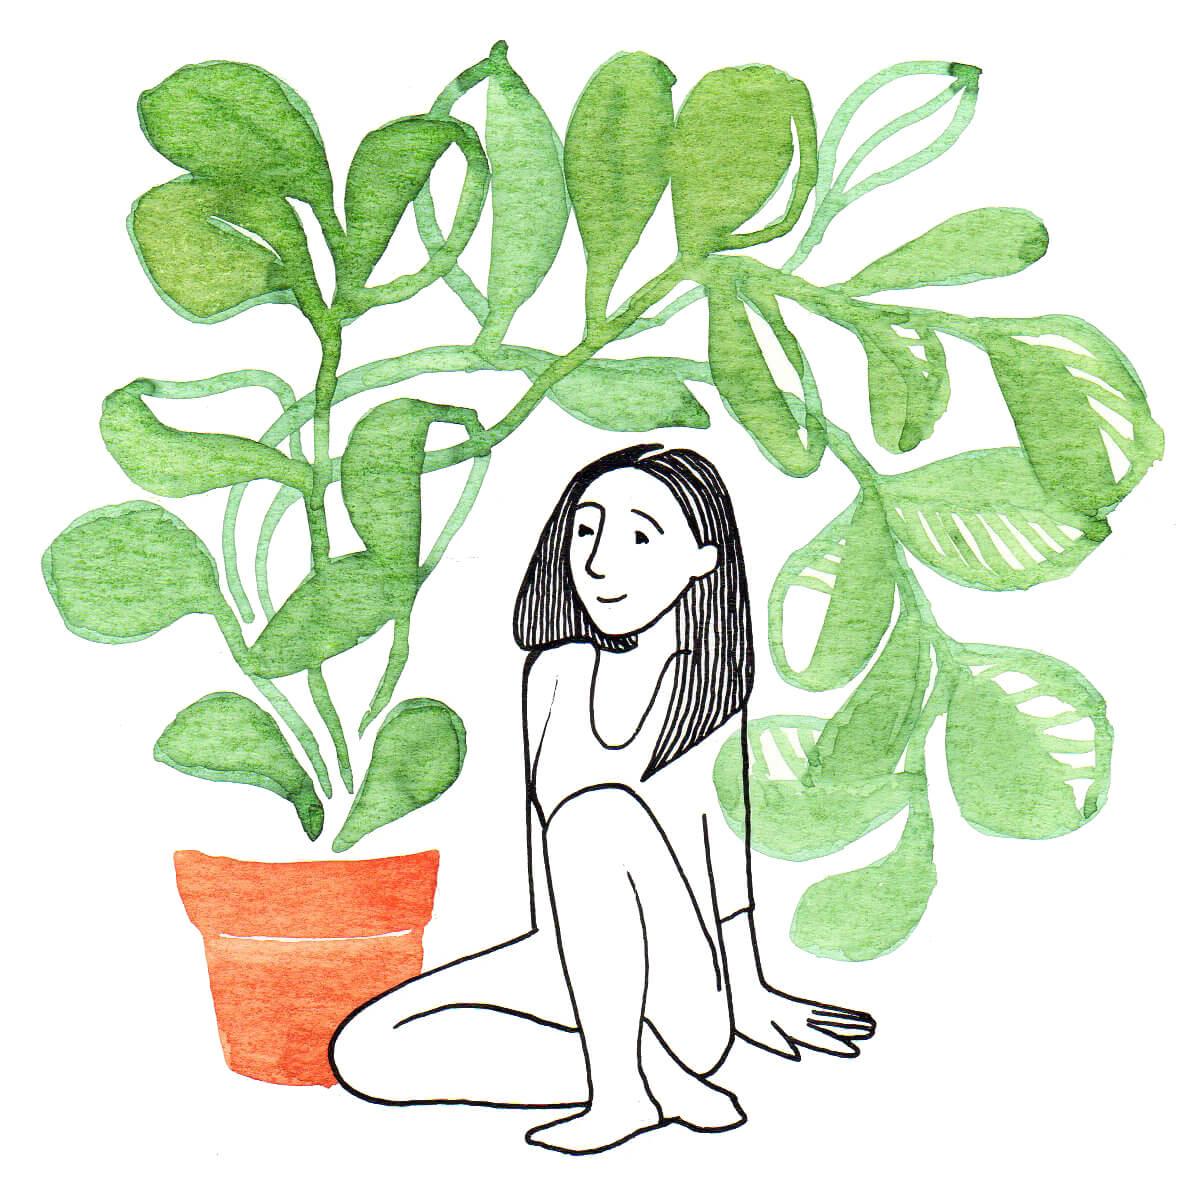 plantenmeisje | tekening door Cynthia Borst